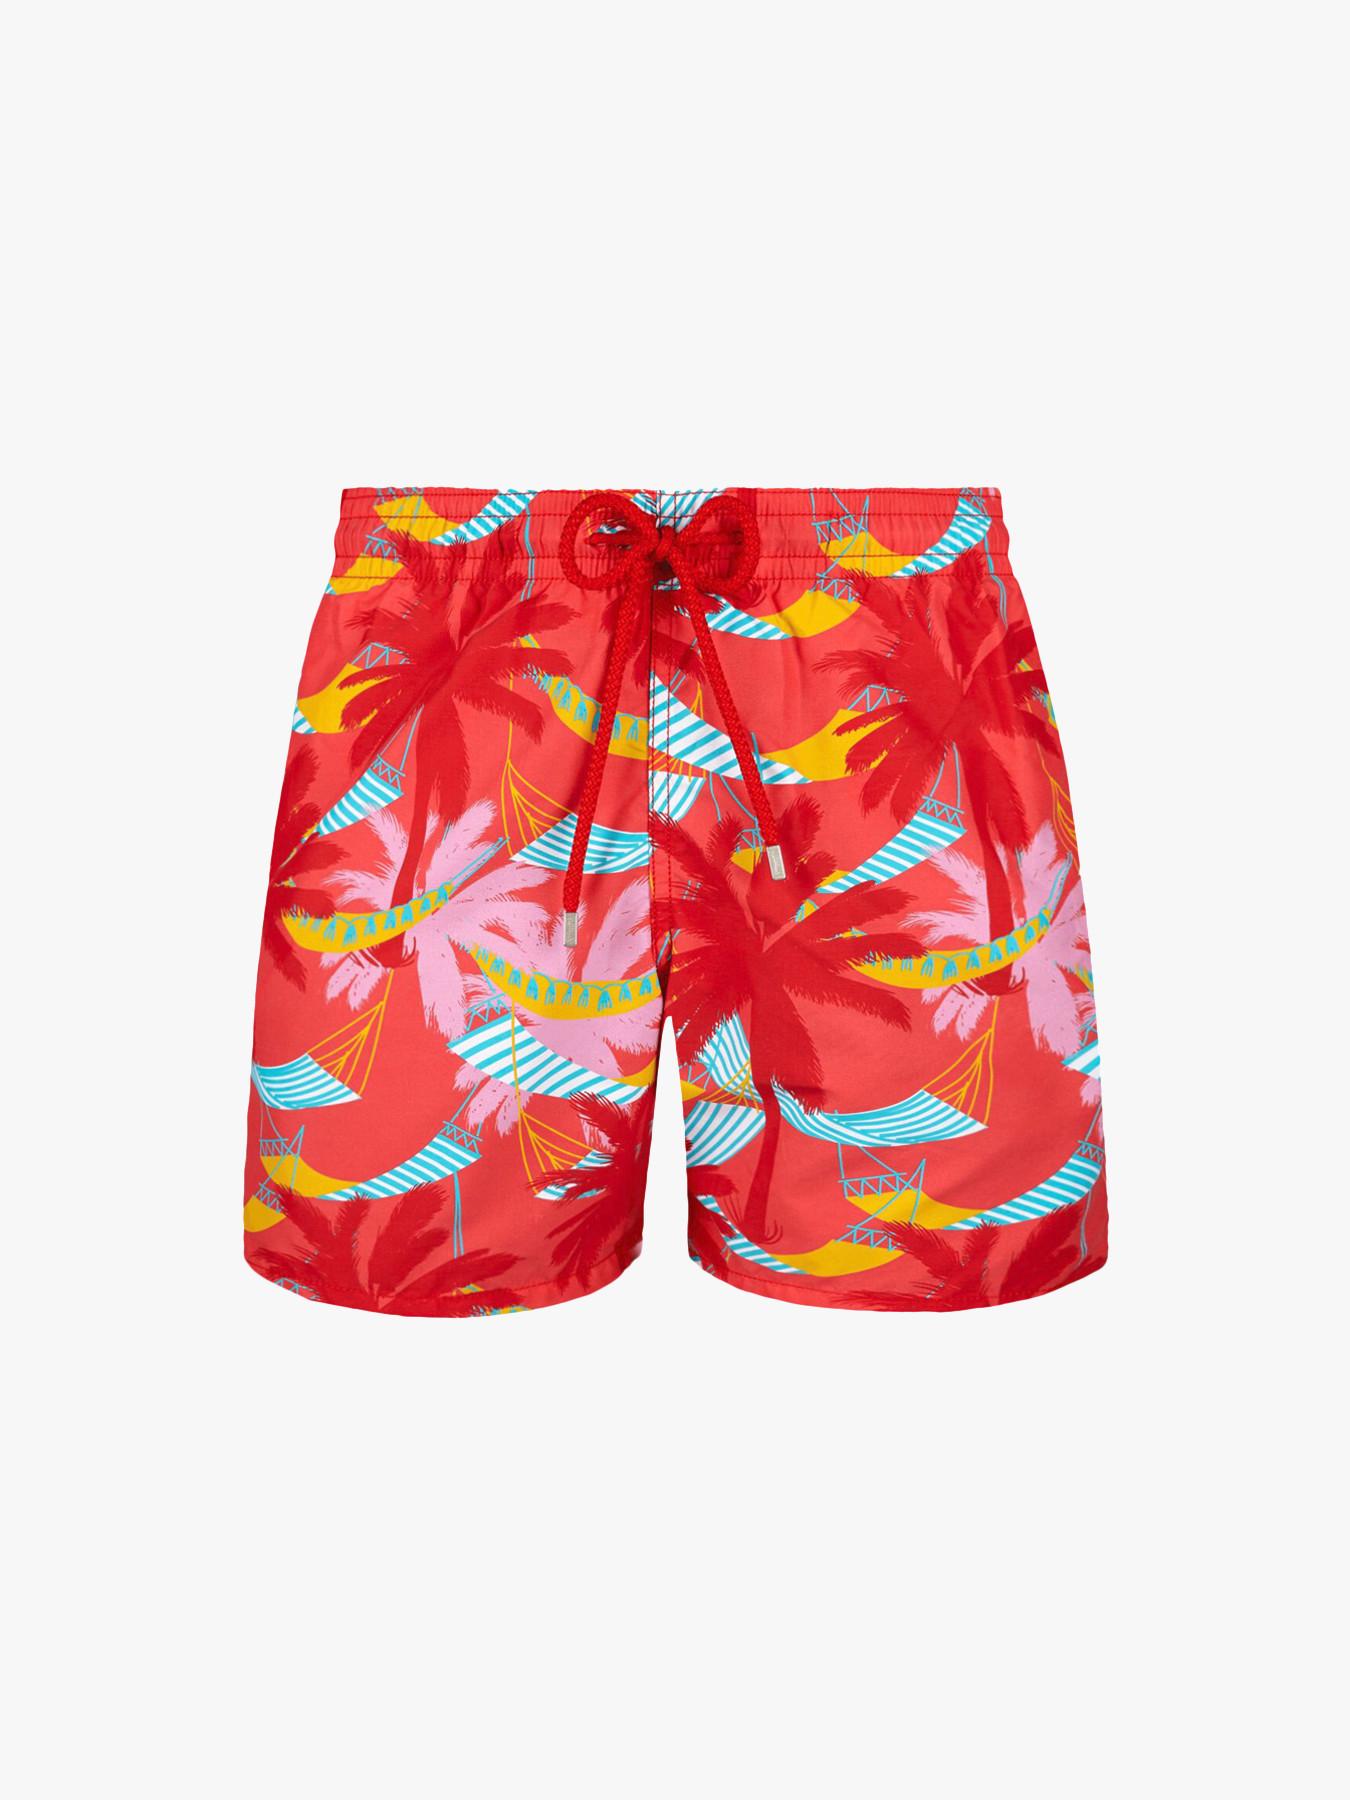 9f500d1e8e Vilebrequin Moorea Hammock Print Swim Shorts | Trunks | Fenwick